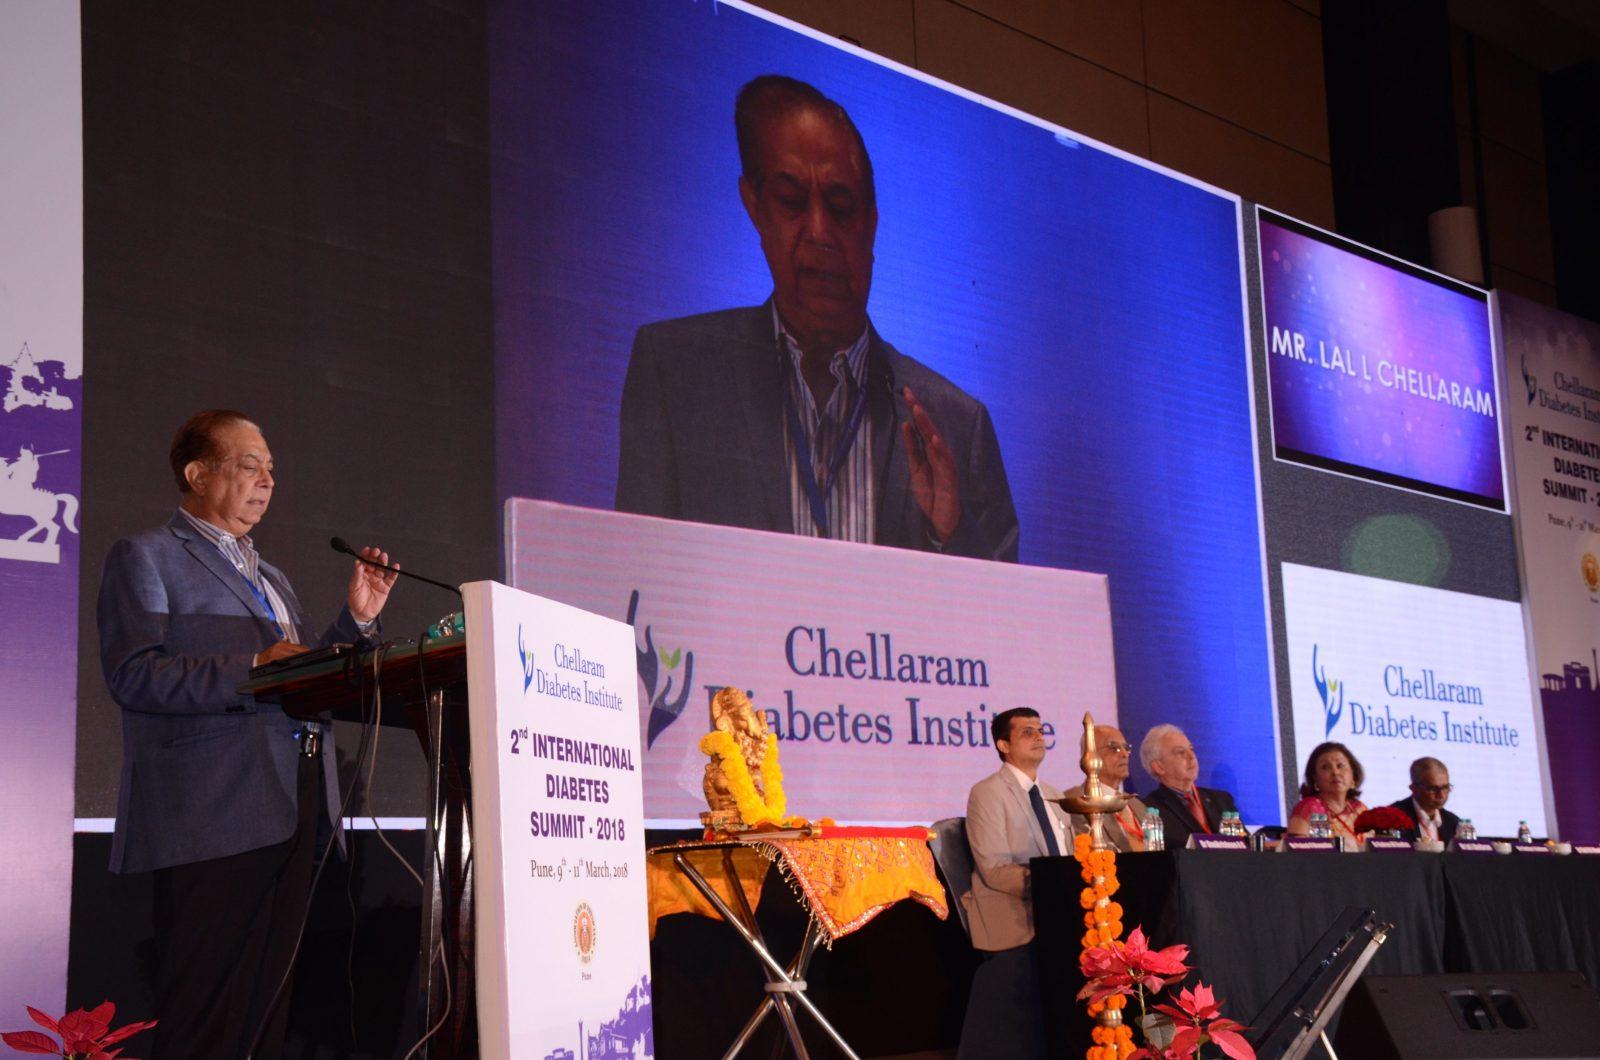 International Diabetes Summit, India